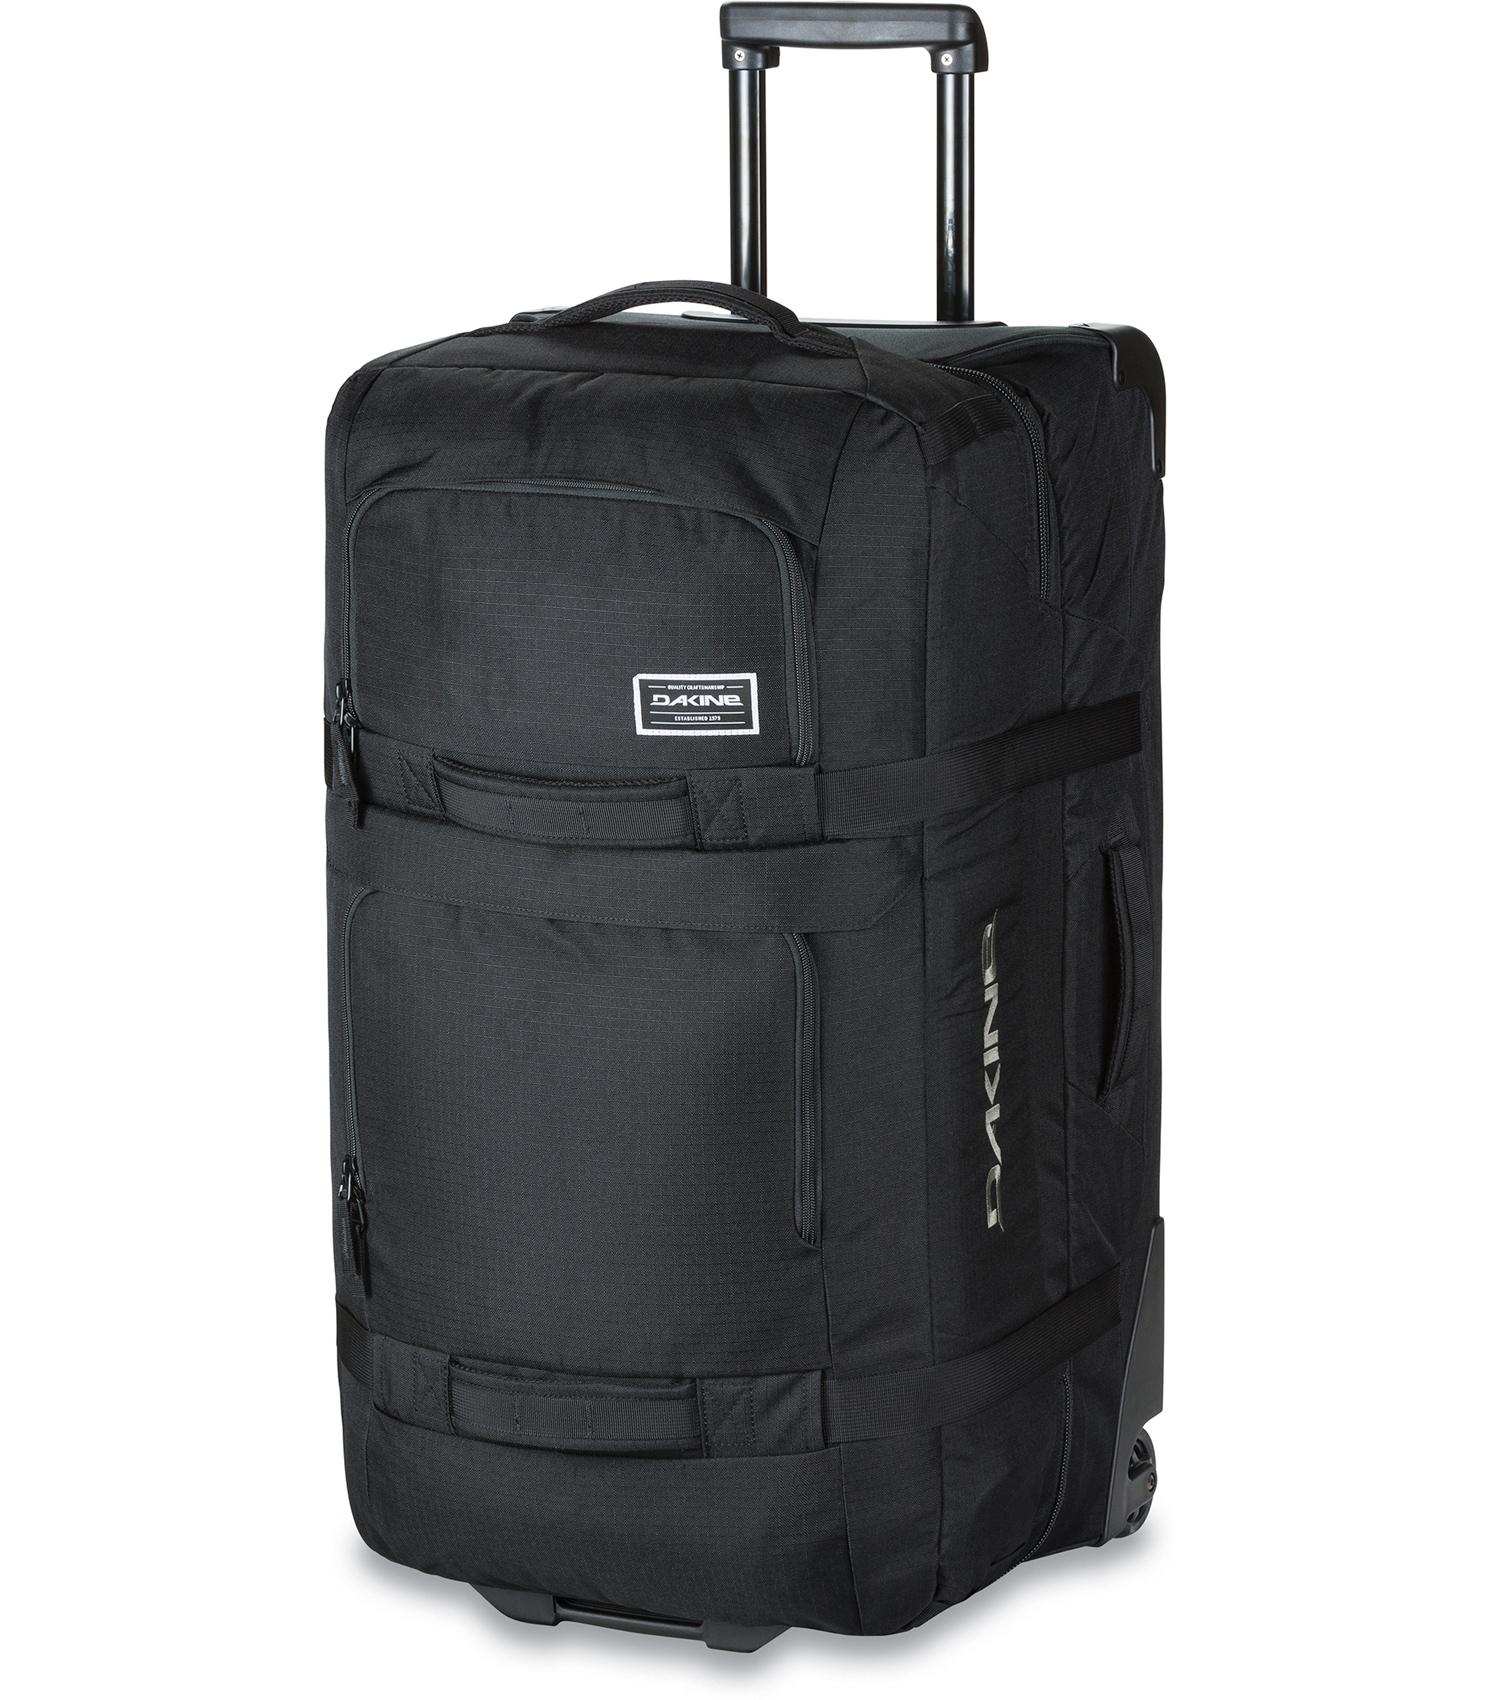 Dakine Luggage Split Roller 85l Travel Bag Wheeled